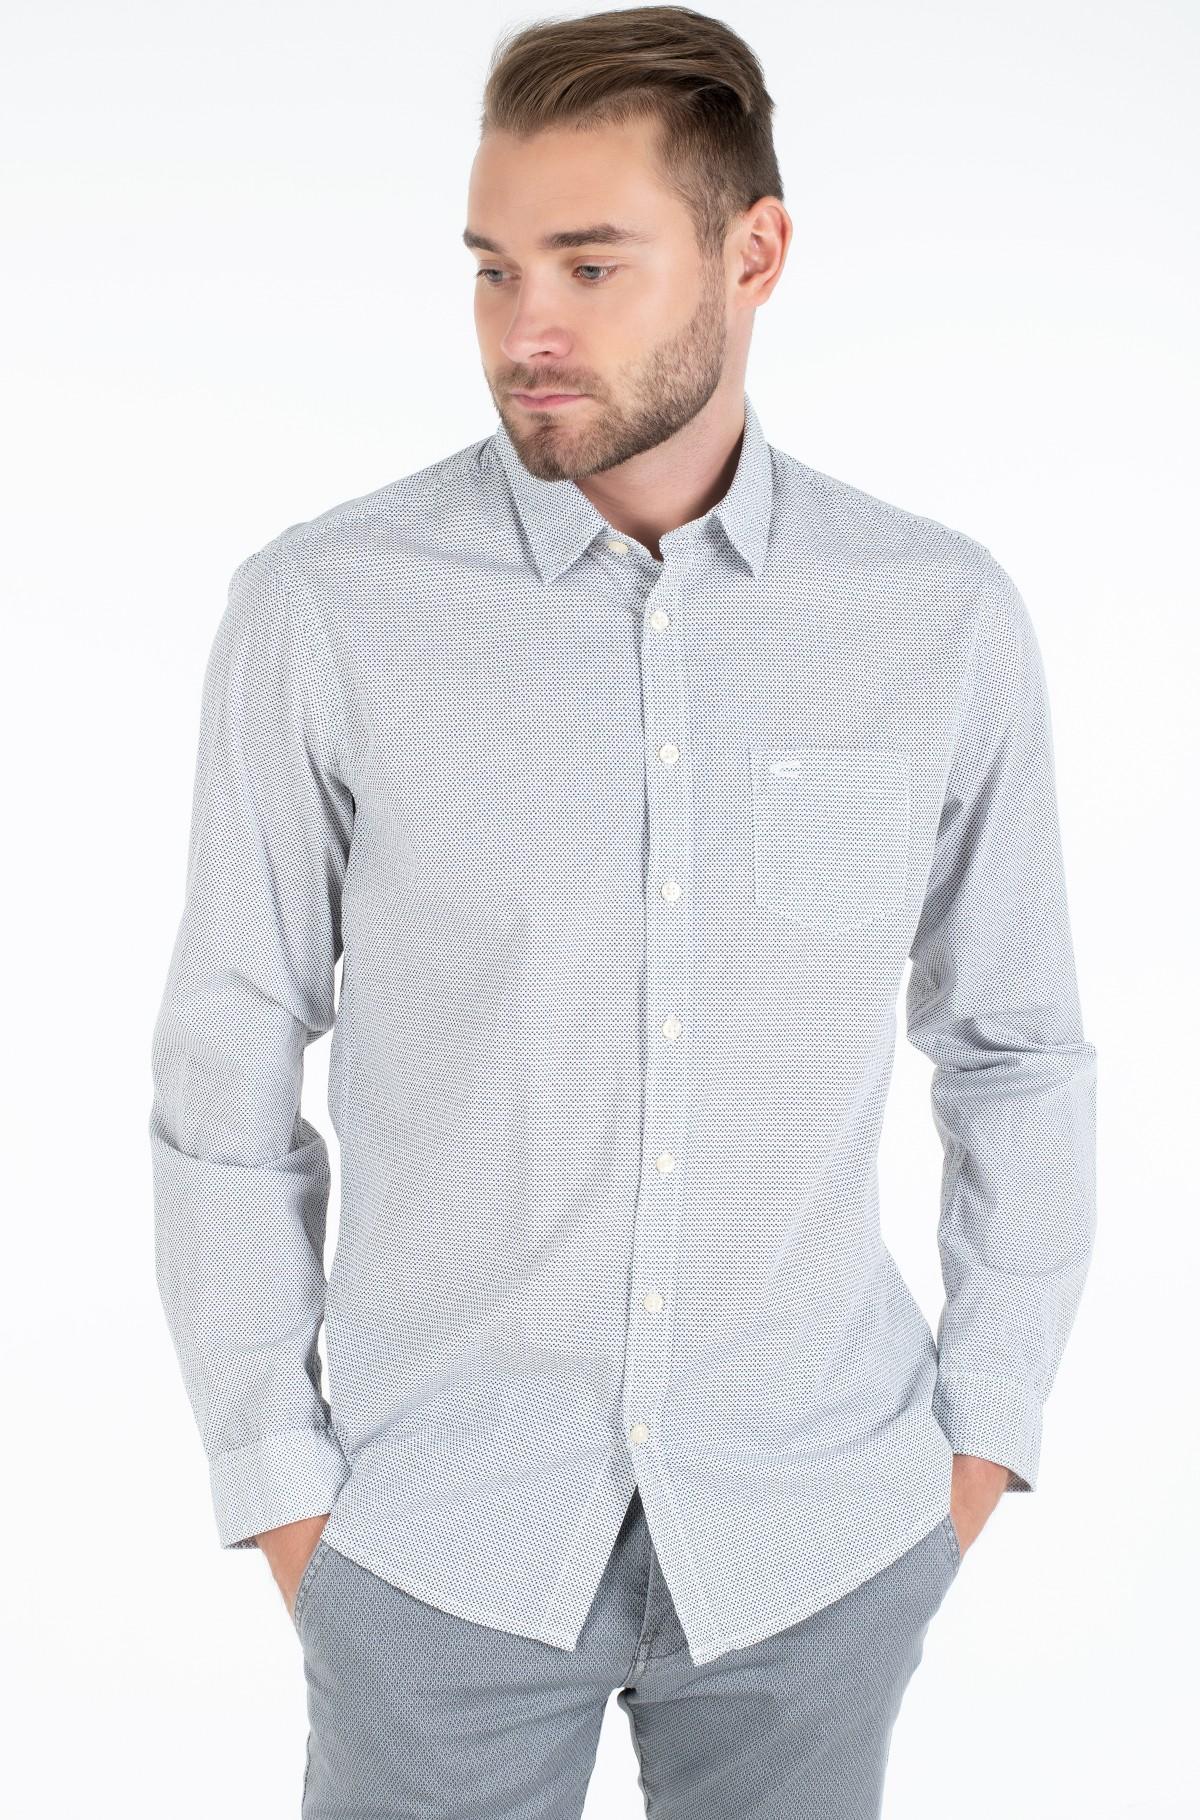 Marškiniai 409121/3S05-full-1